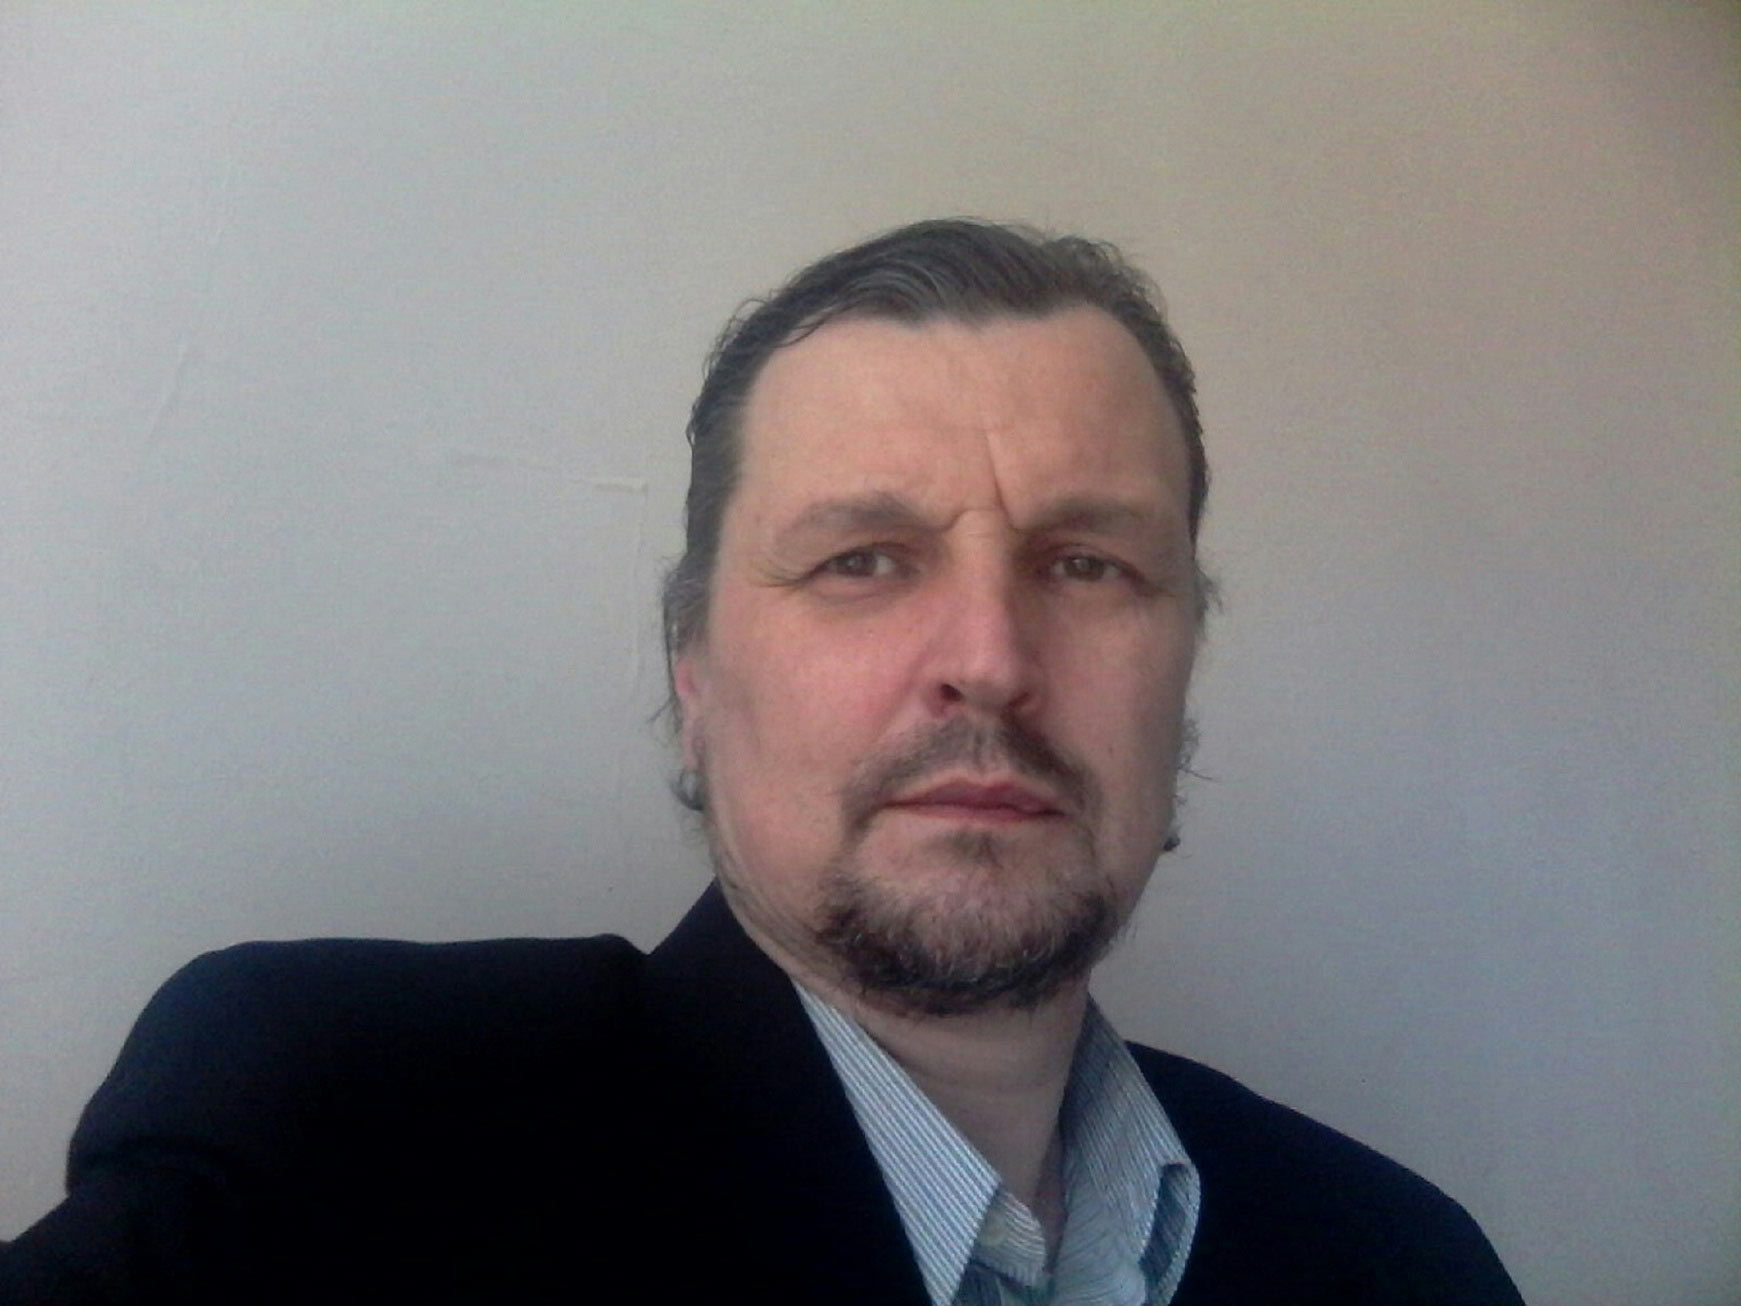 Антон Котенев. Бизнес призвание